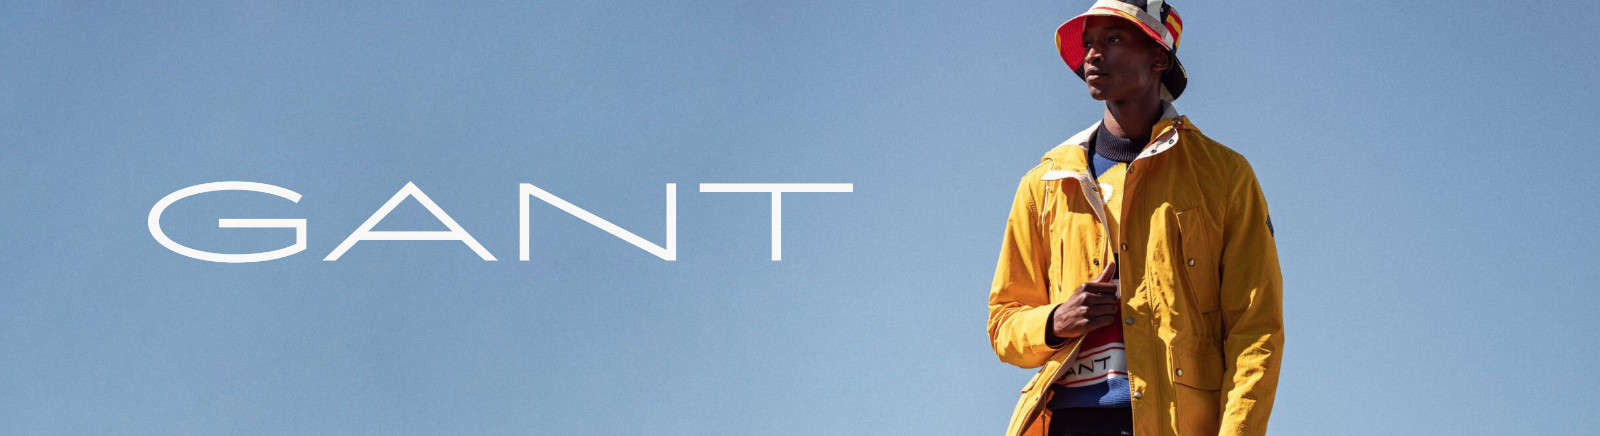 Gant Herrenschuhe online entdecken im Juppen Schuhe Shop